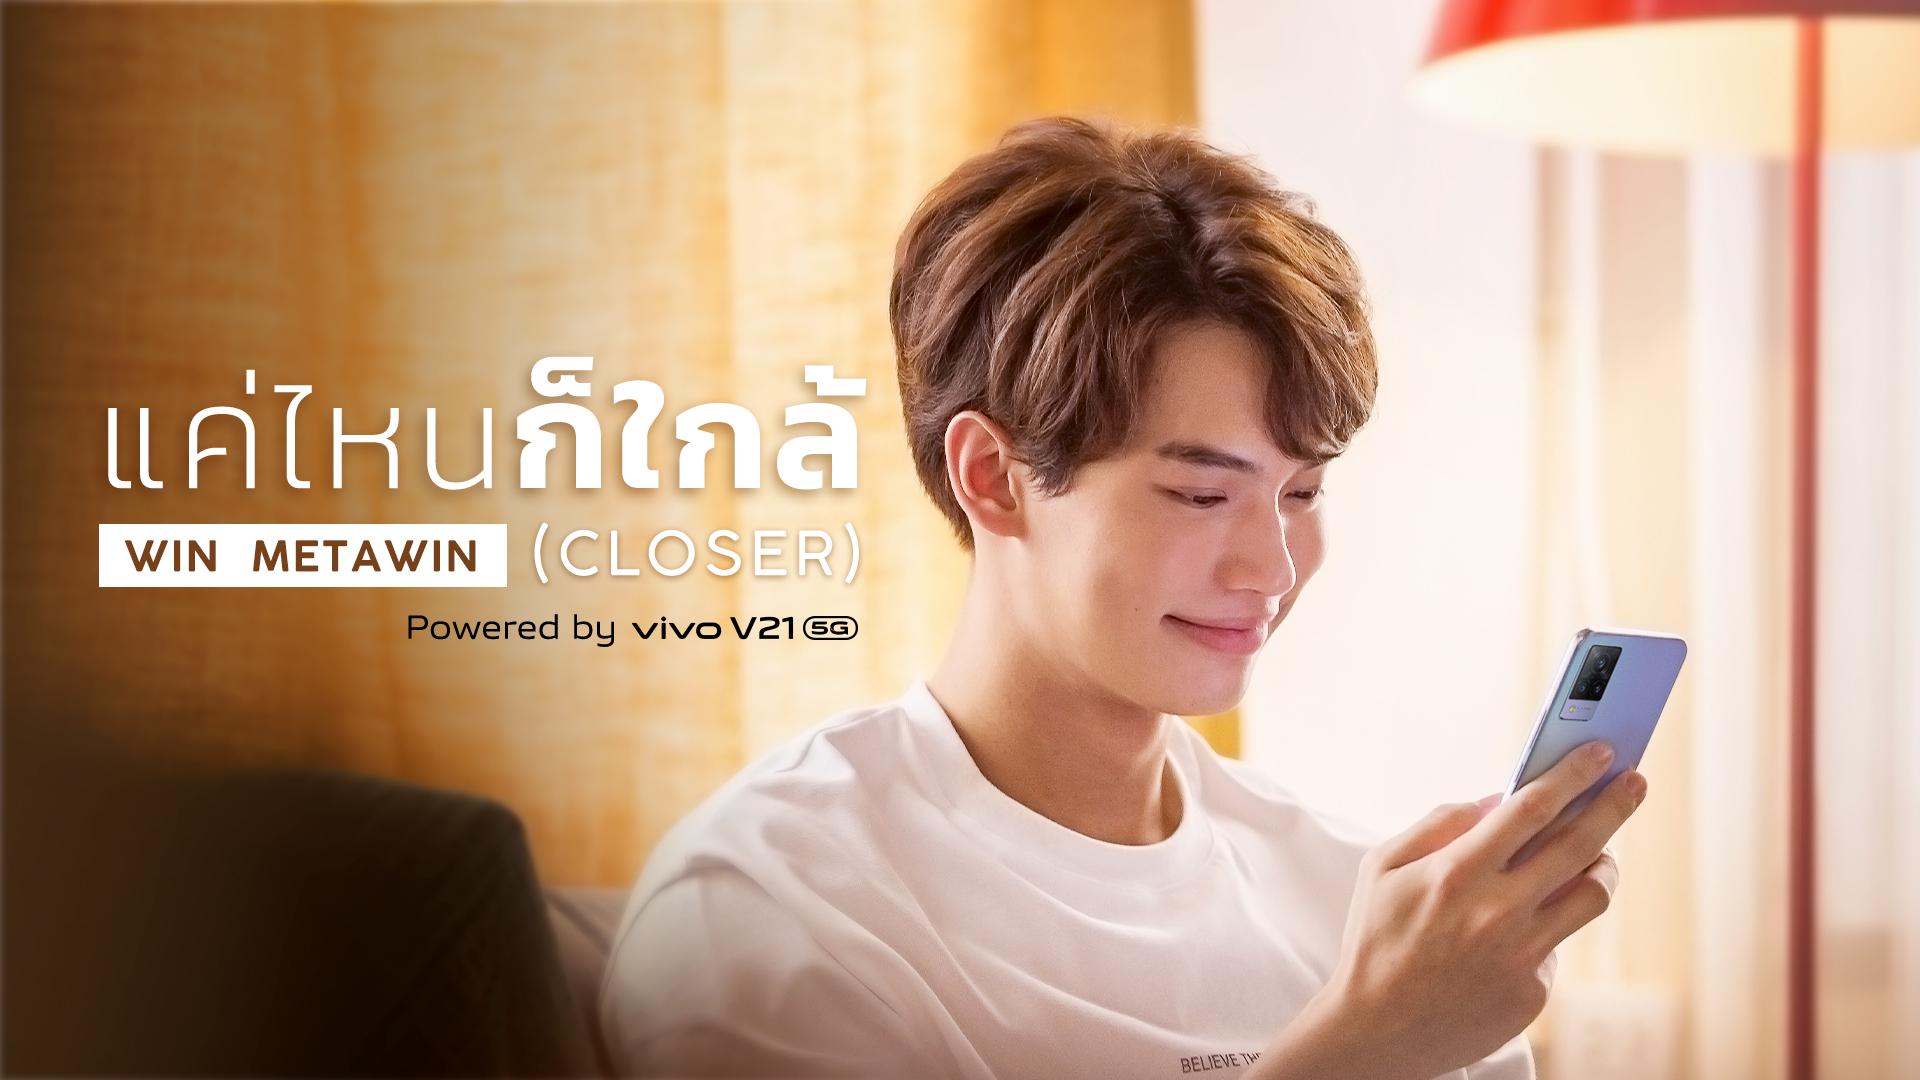 CLOSER smartphones V21 5G Vivo วิน-เมธวิน โอภาสเอี่ยมขจร สมาร์ทโฟน แค่ไหนก็ใกล้